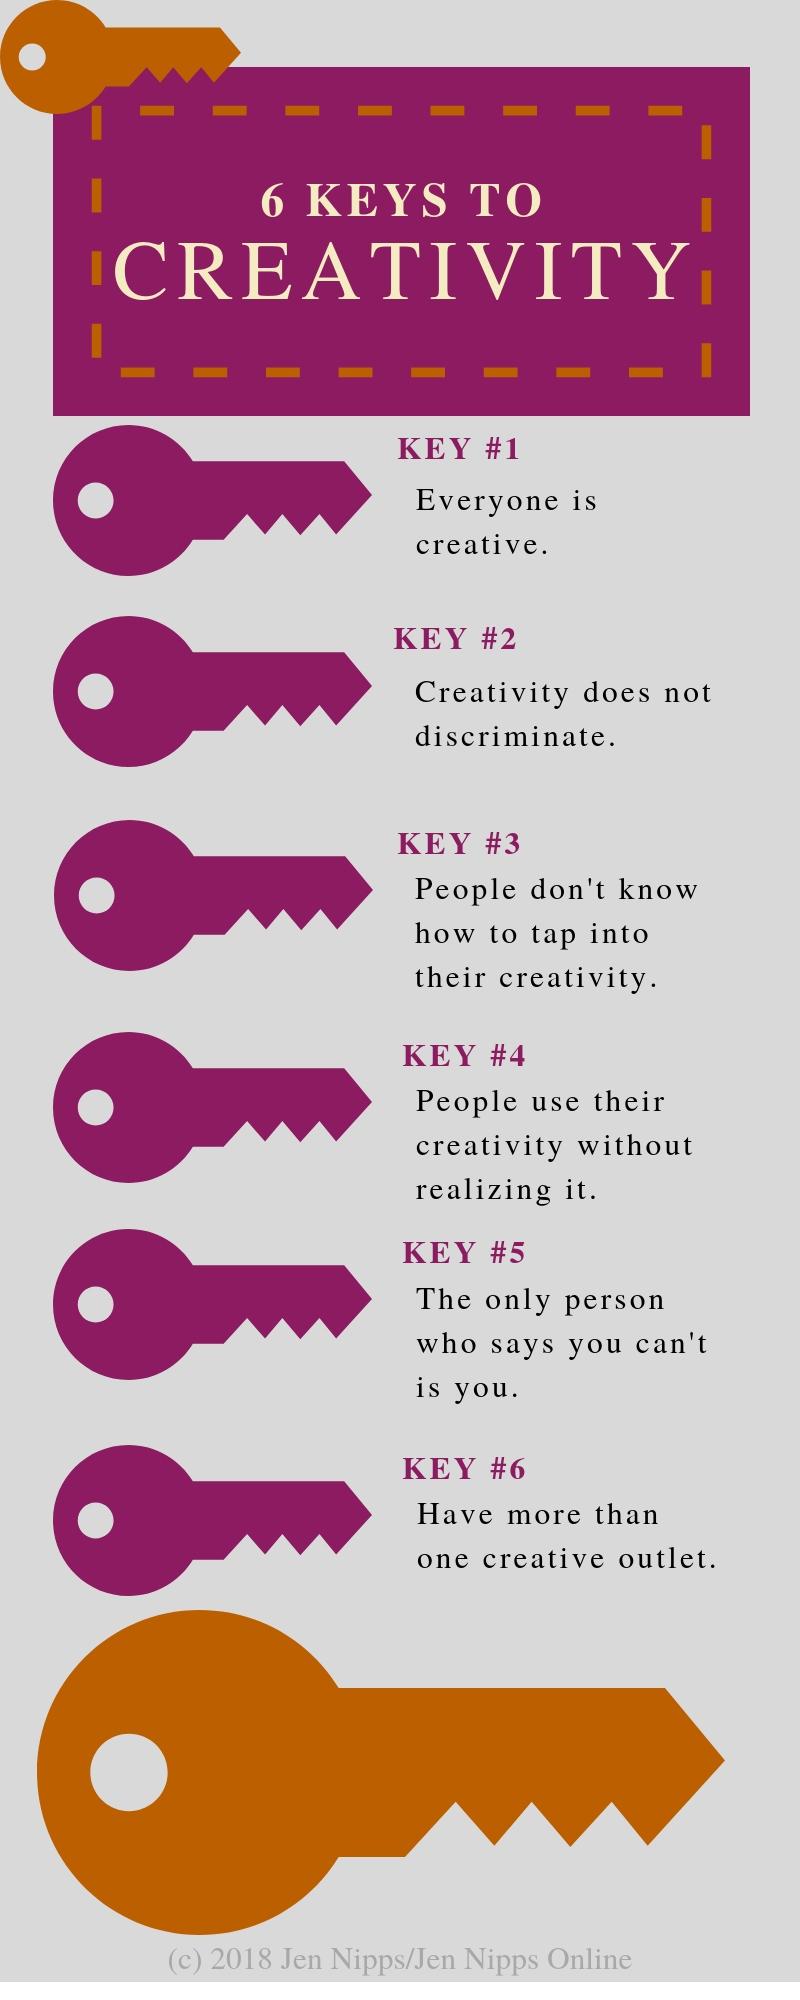 creativitykeysinfographic